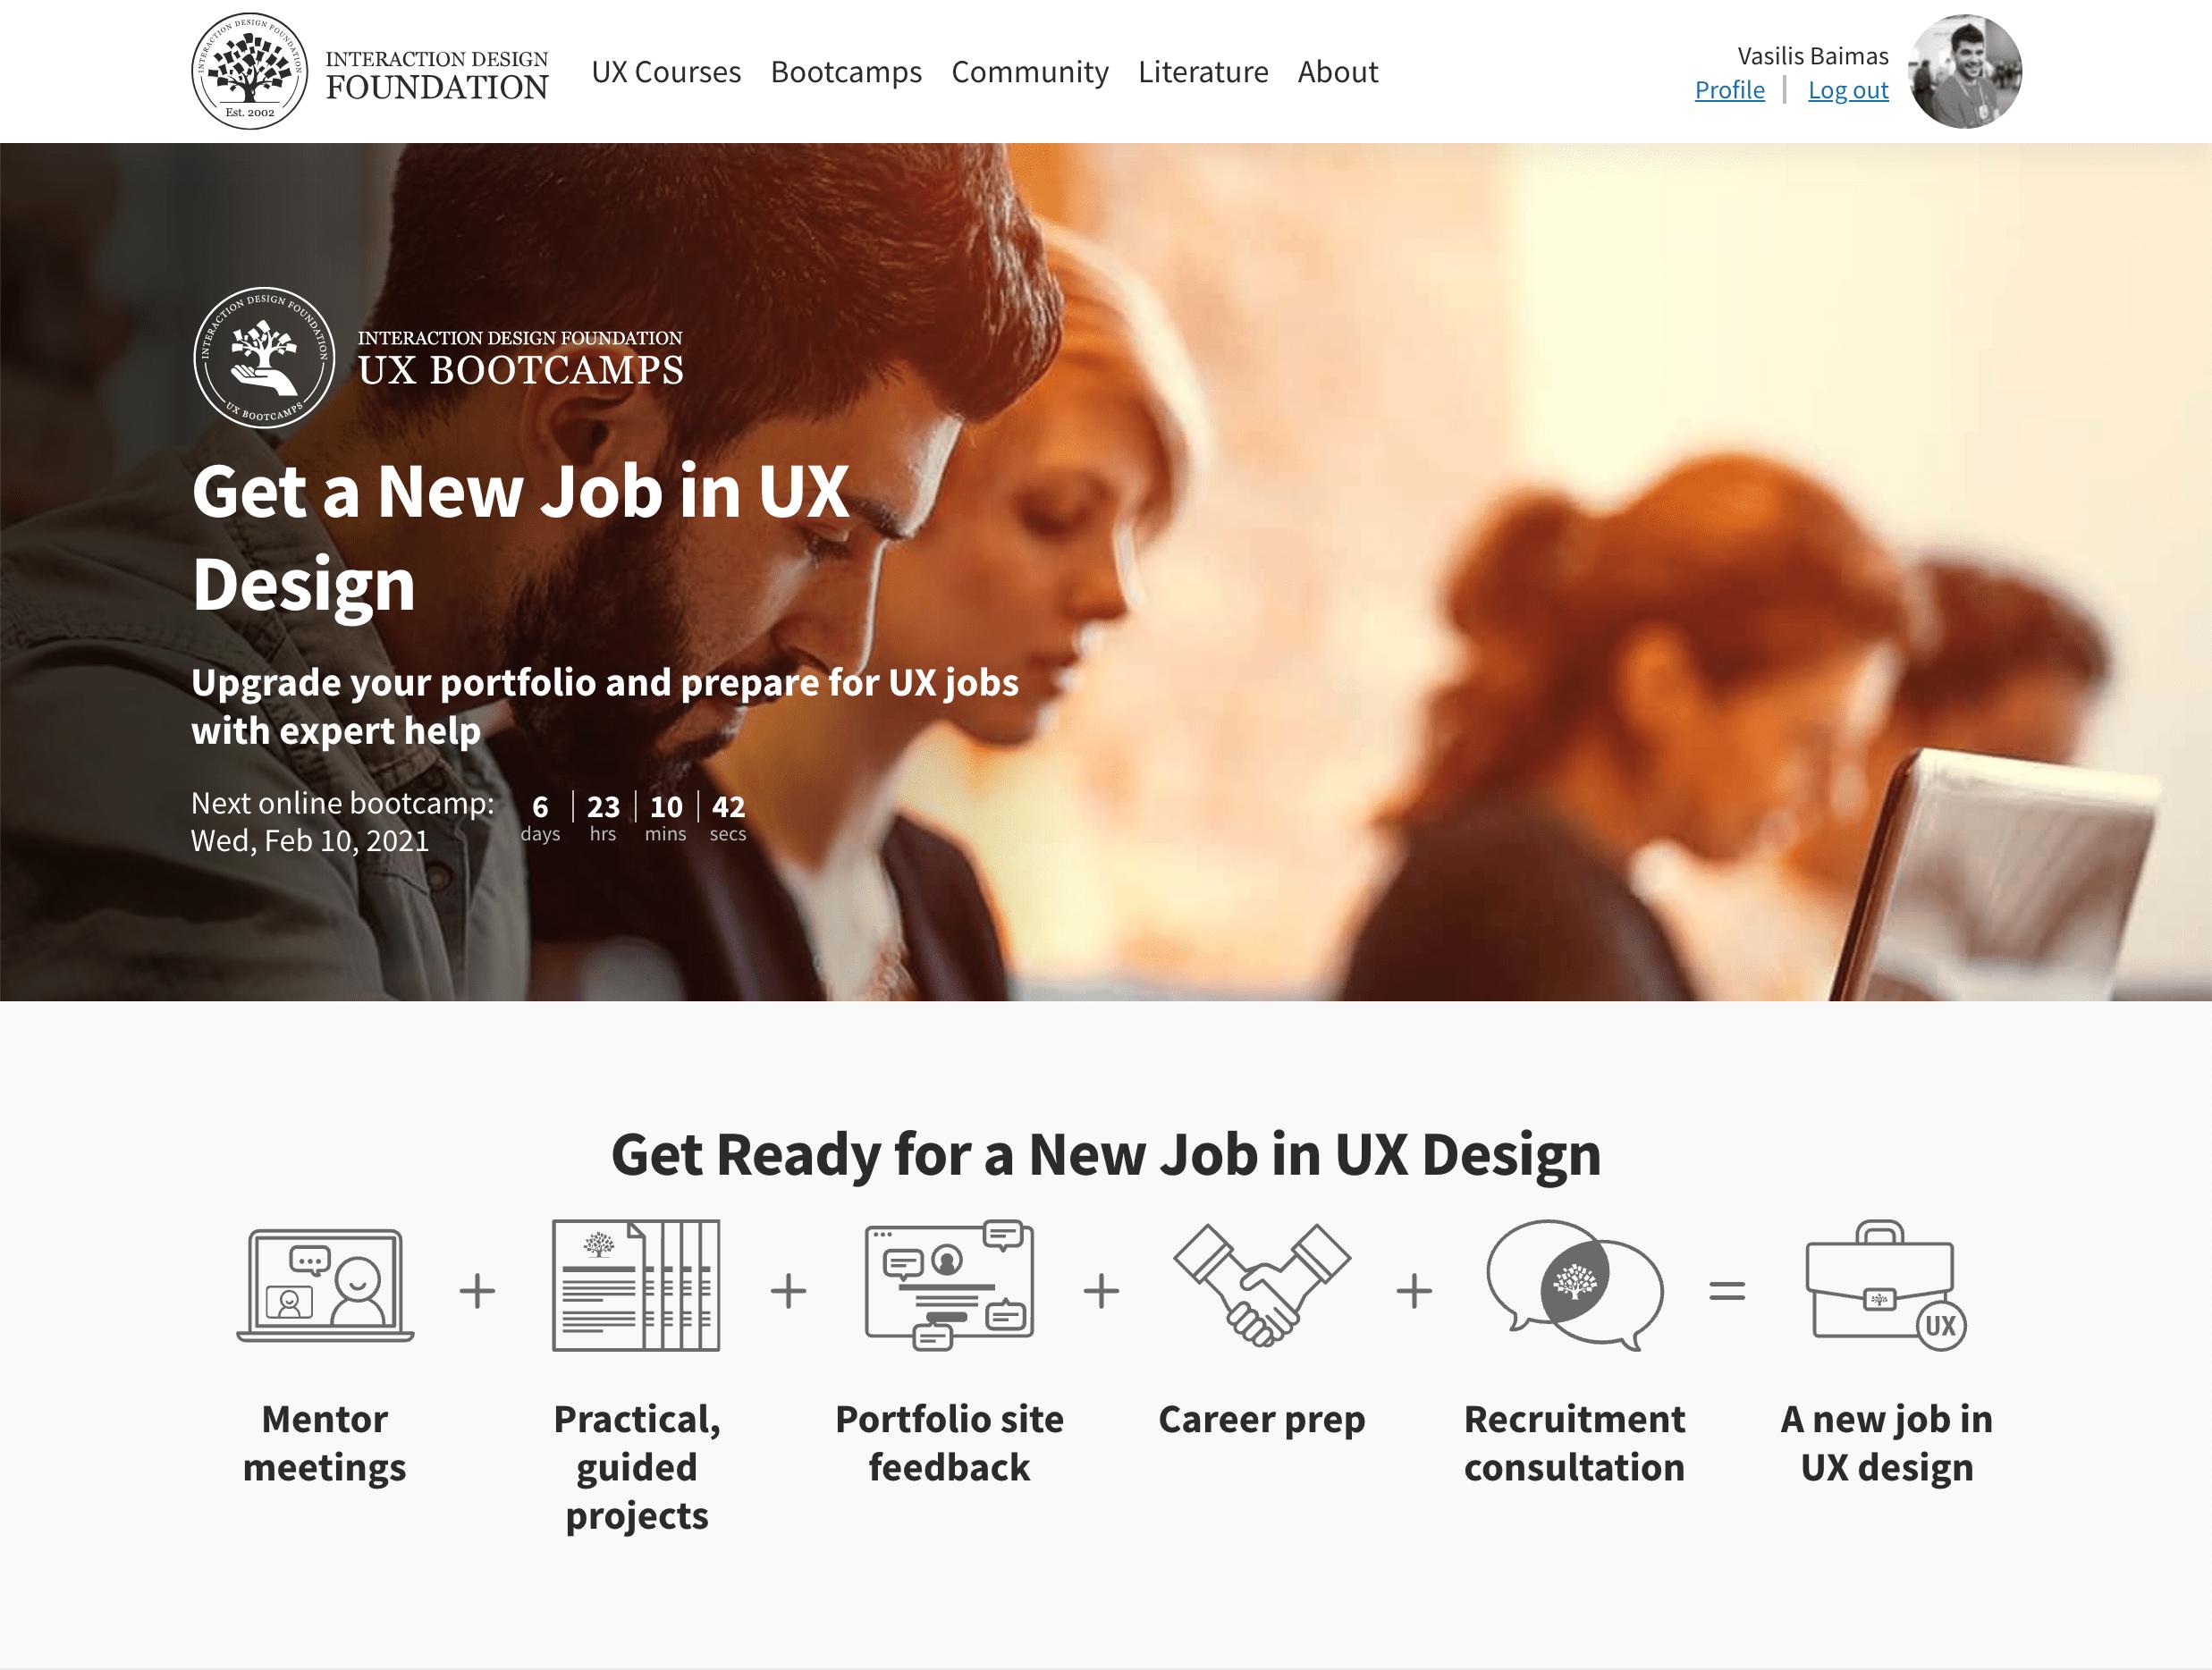 Get a New Job in UX Design